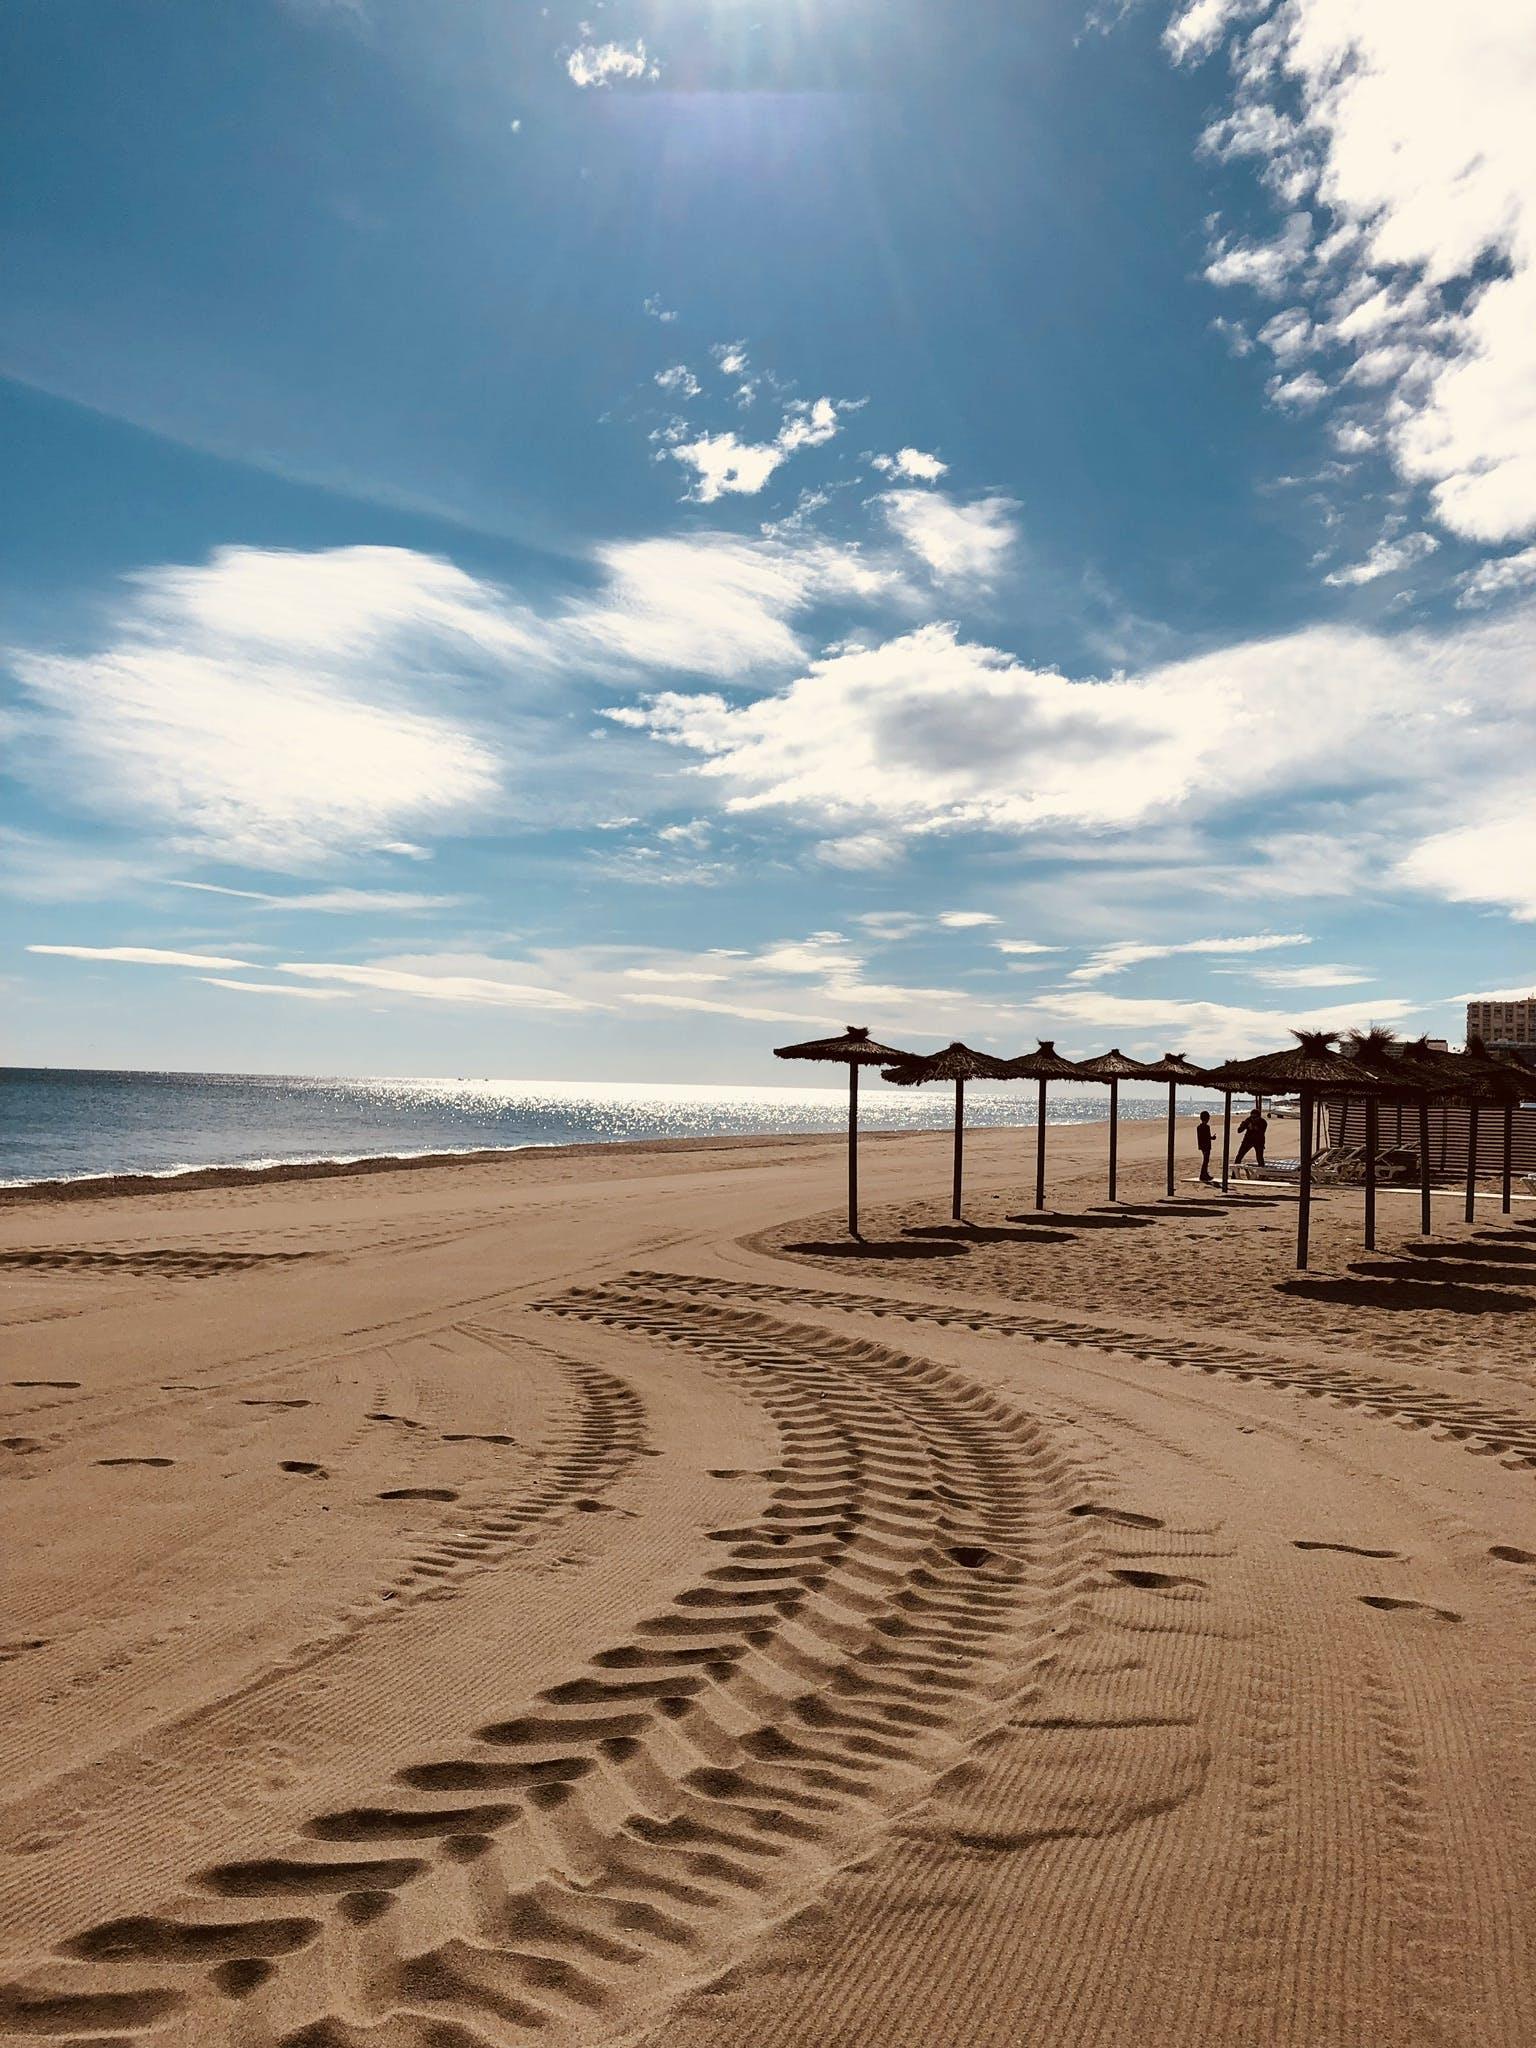 Brown Sand Near Seashore Under Cloudy Sky